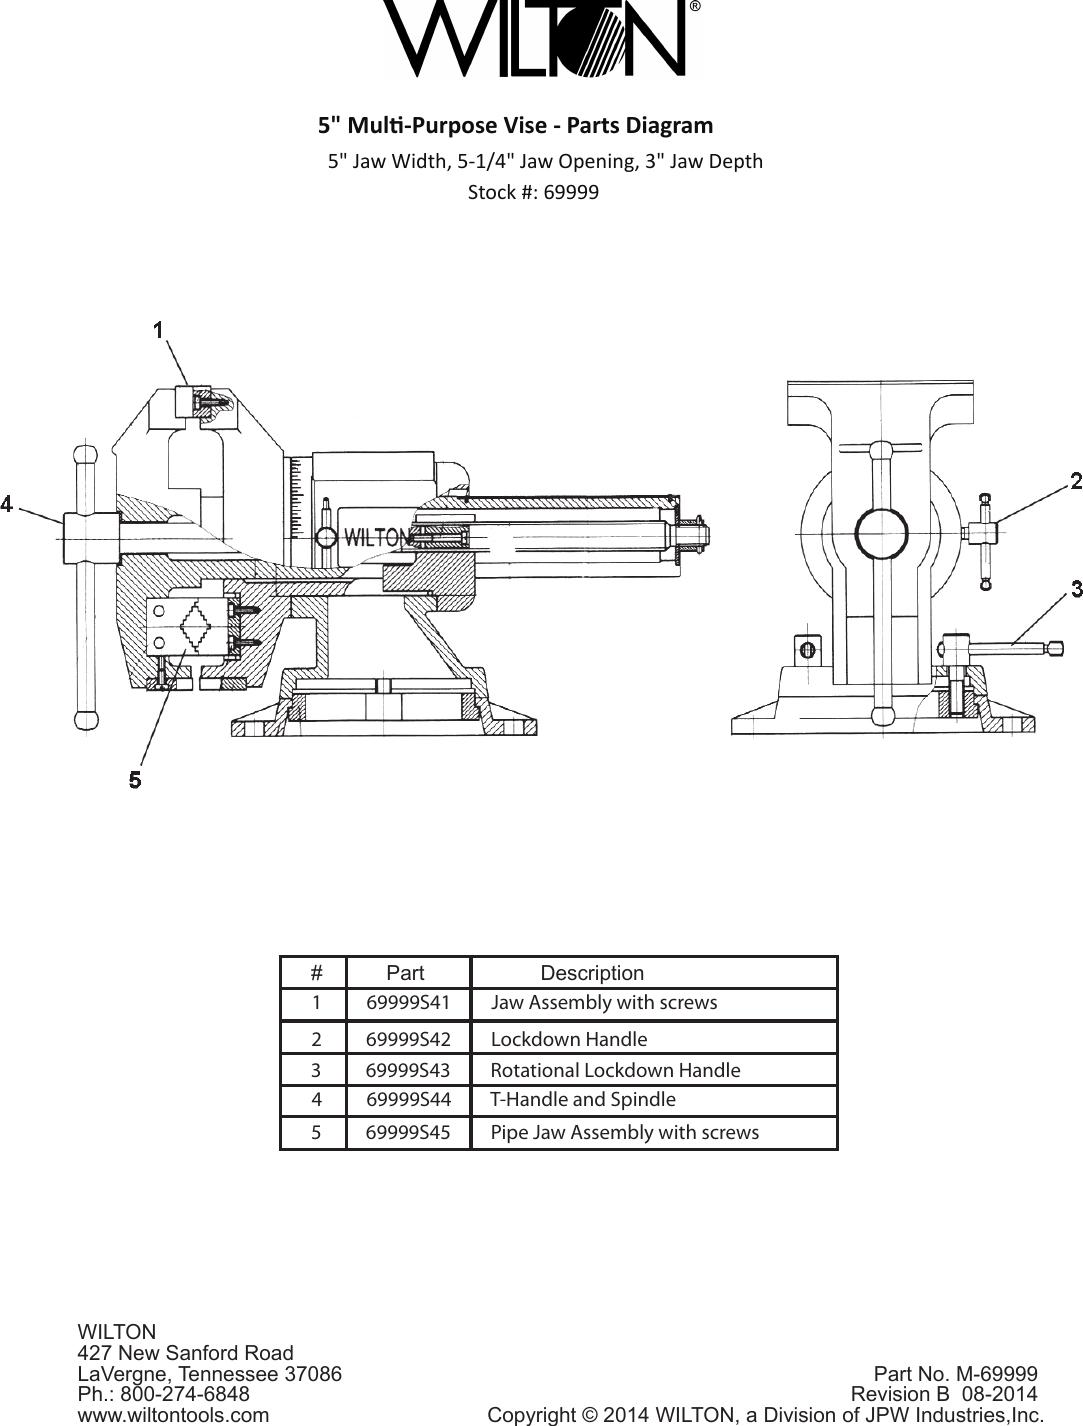 Wilton Multi Purpose Vise 69999 Users Manual 5inch Rev A Parts Diagram